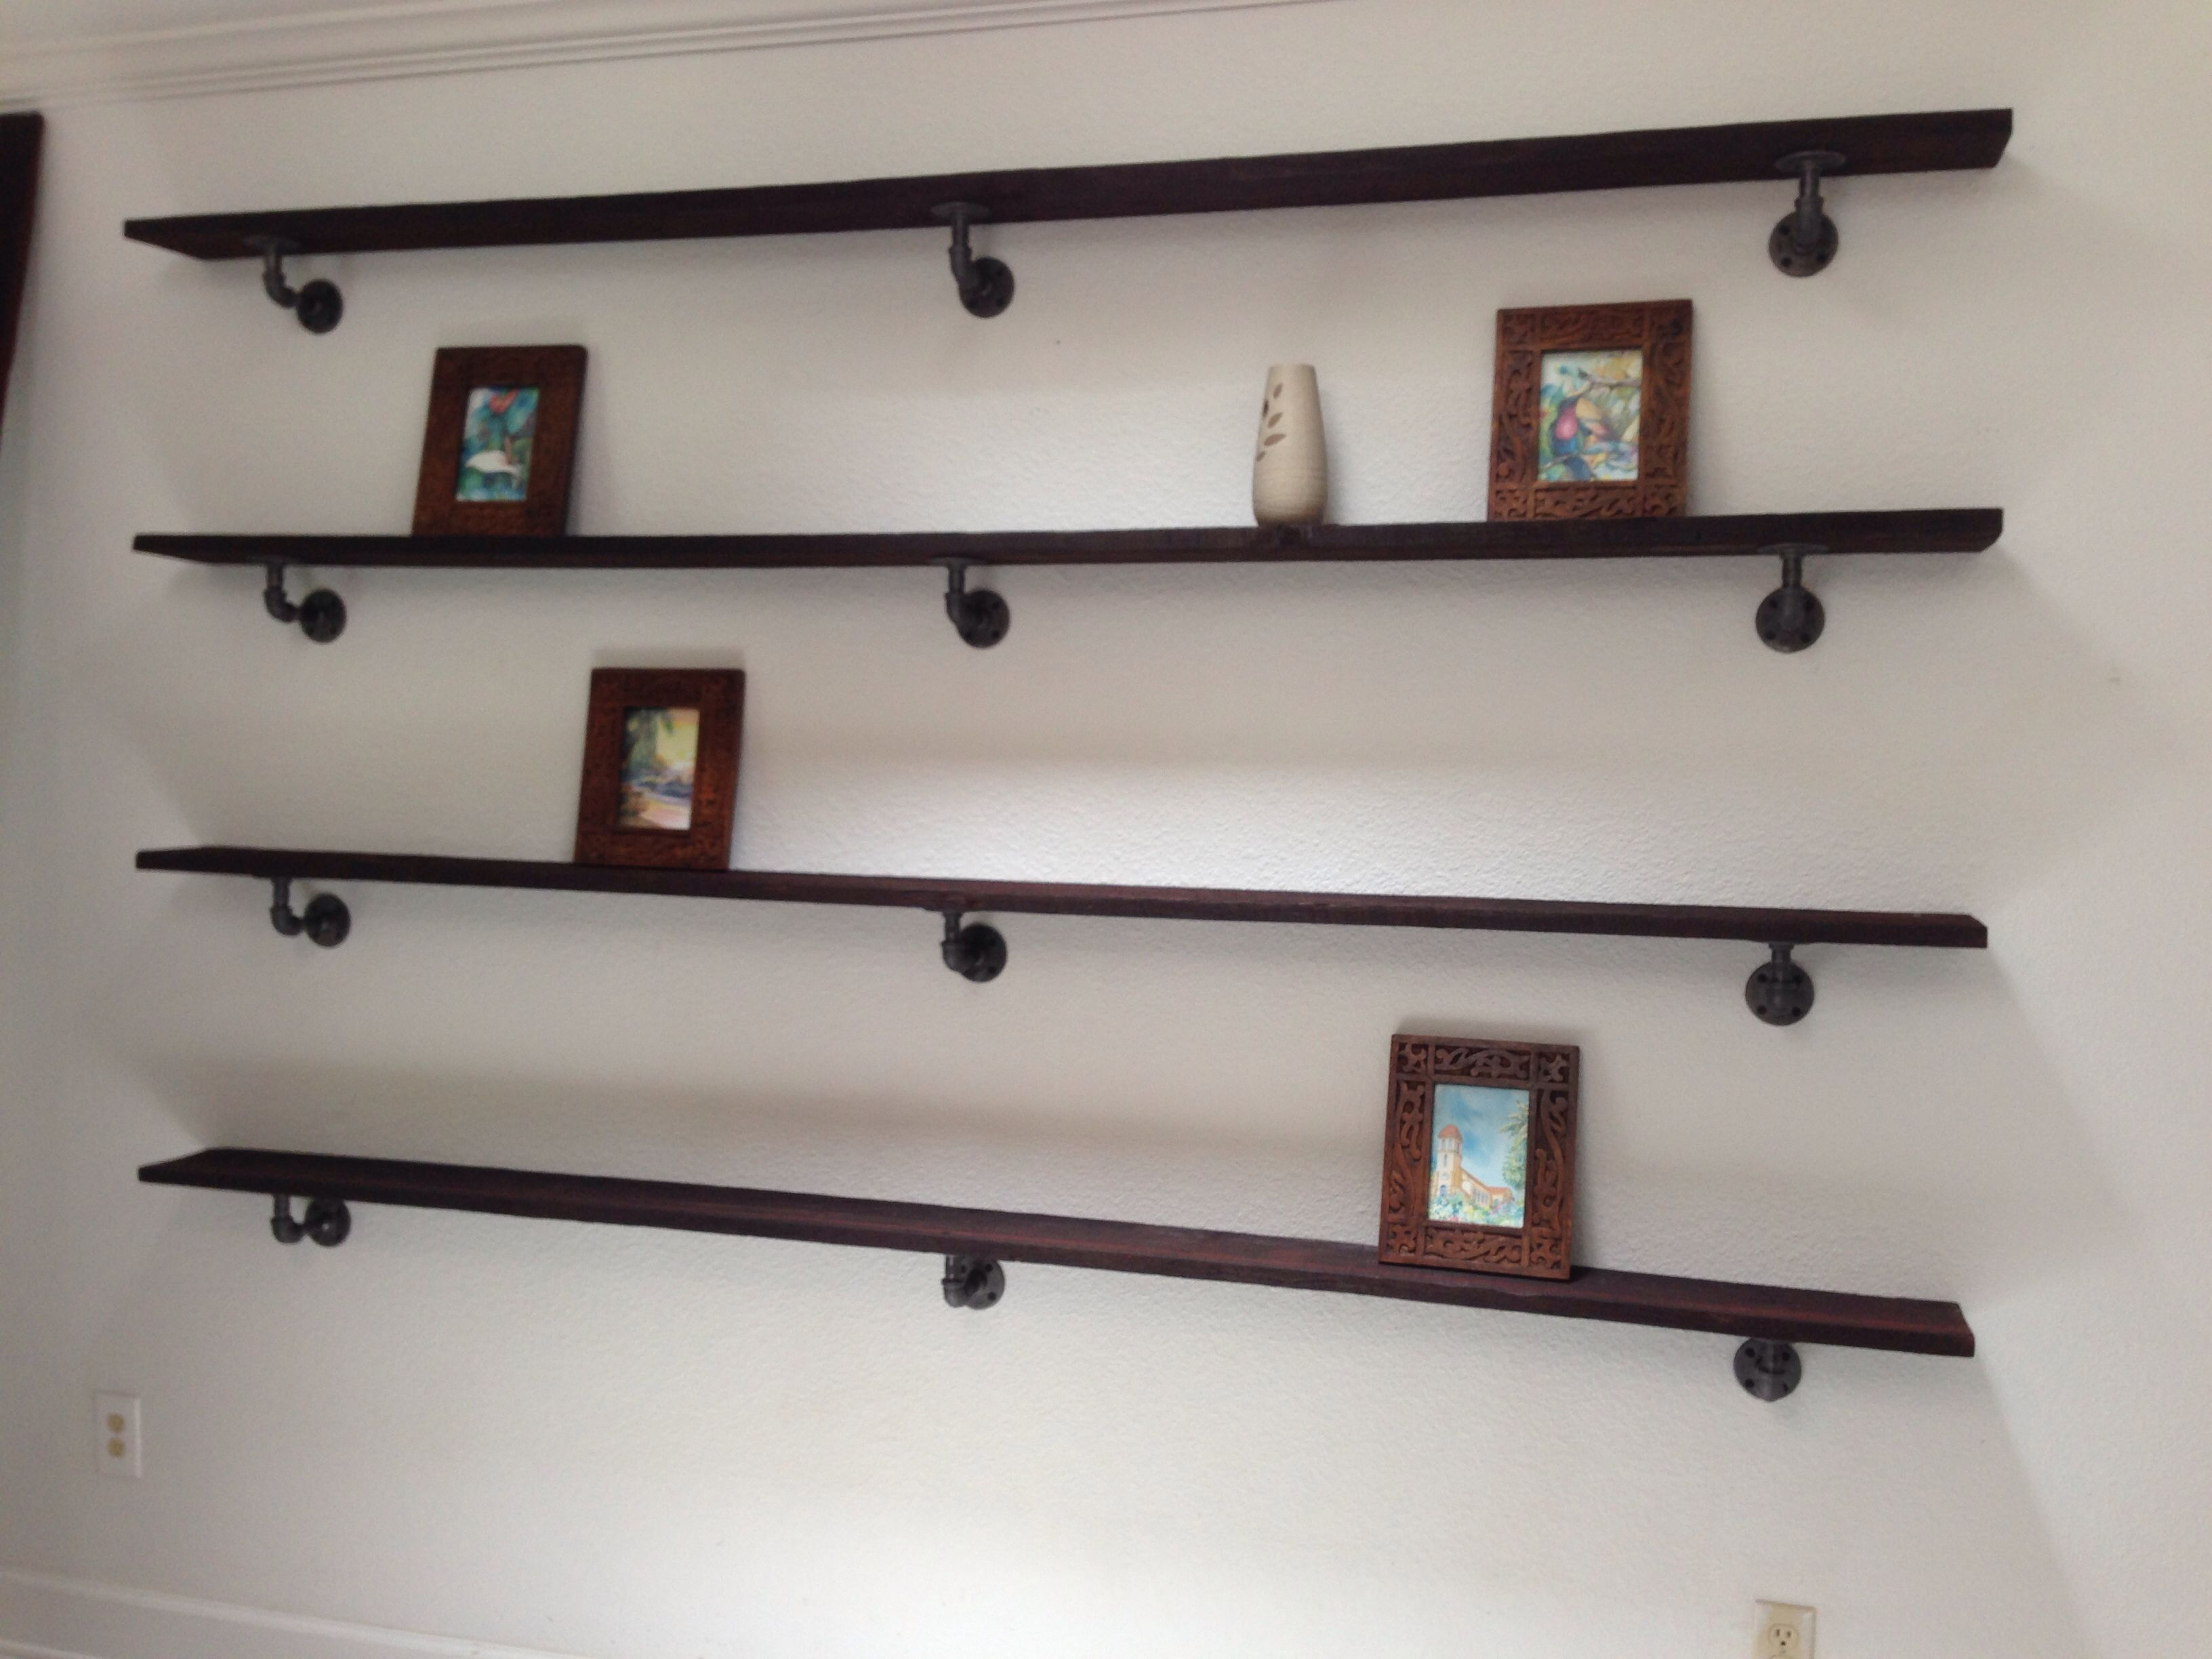 Custom barn wood shelves with urban rustic plumbing pipe I think